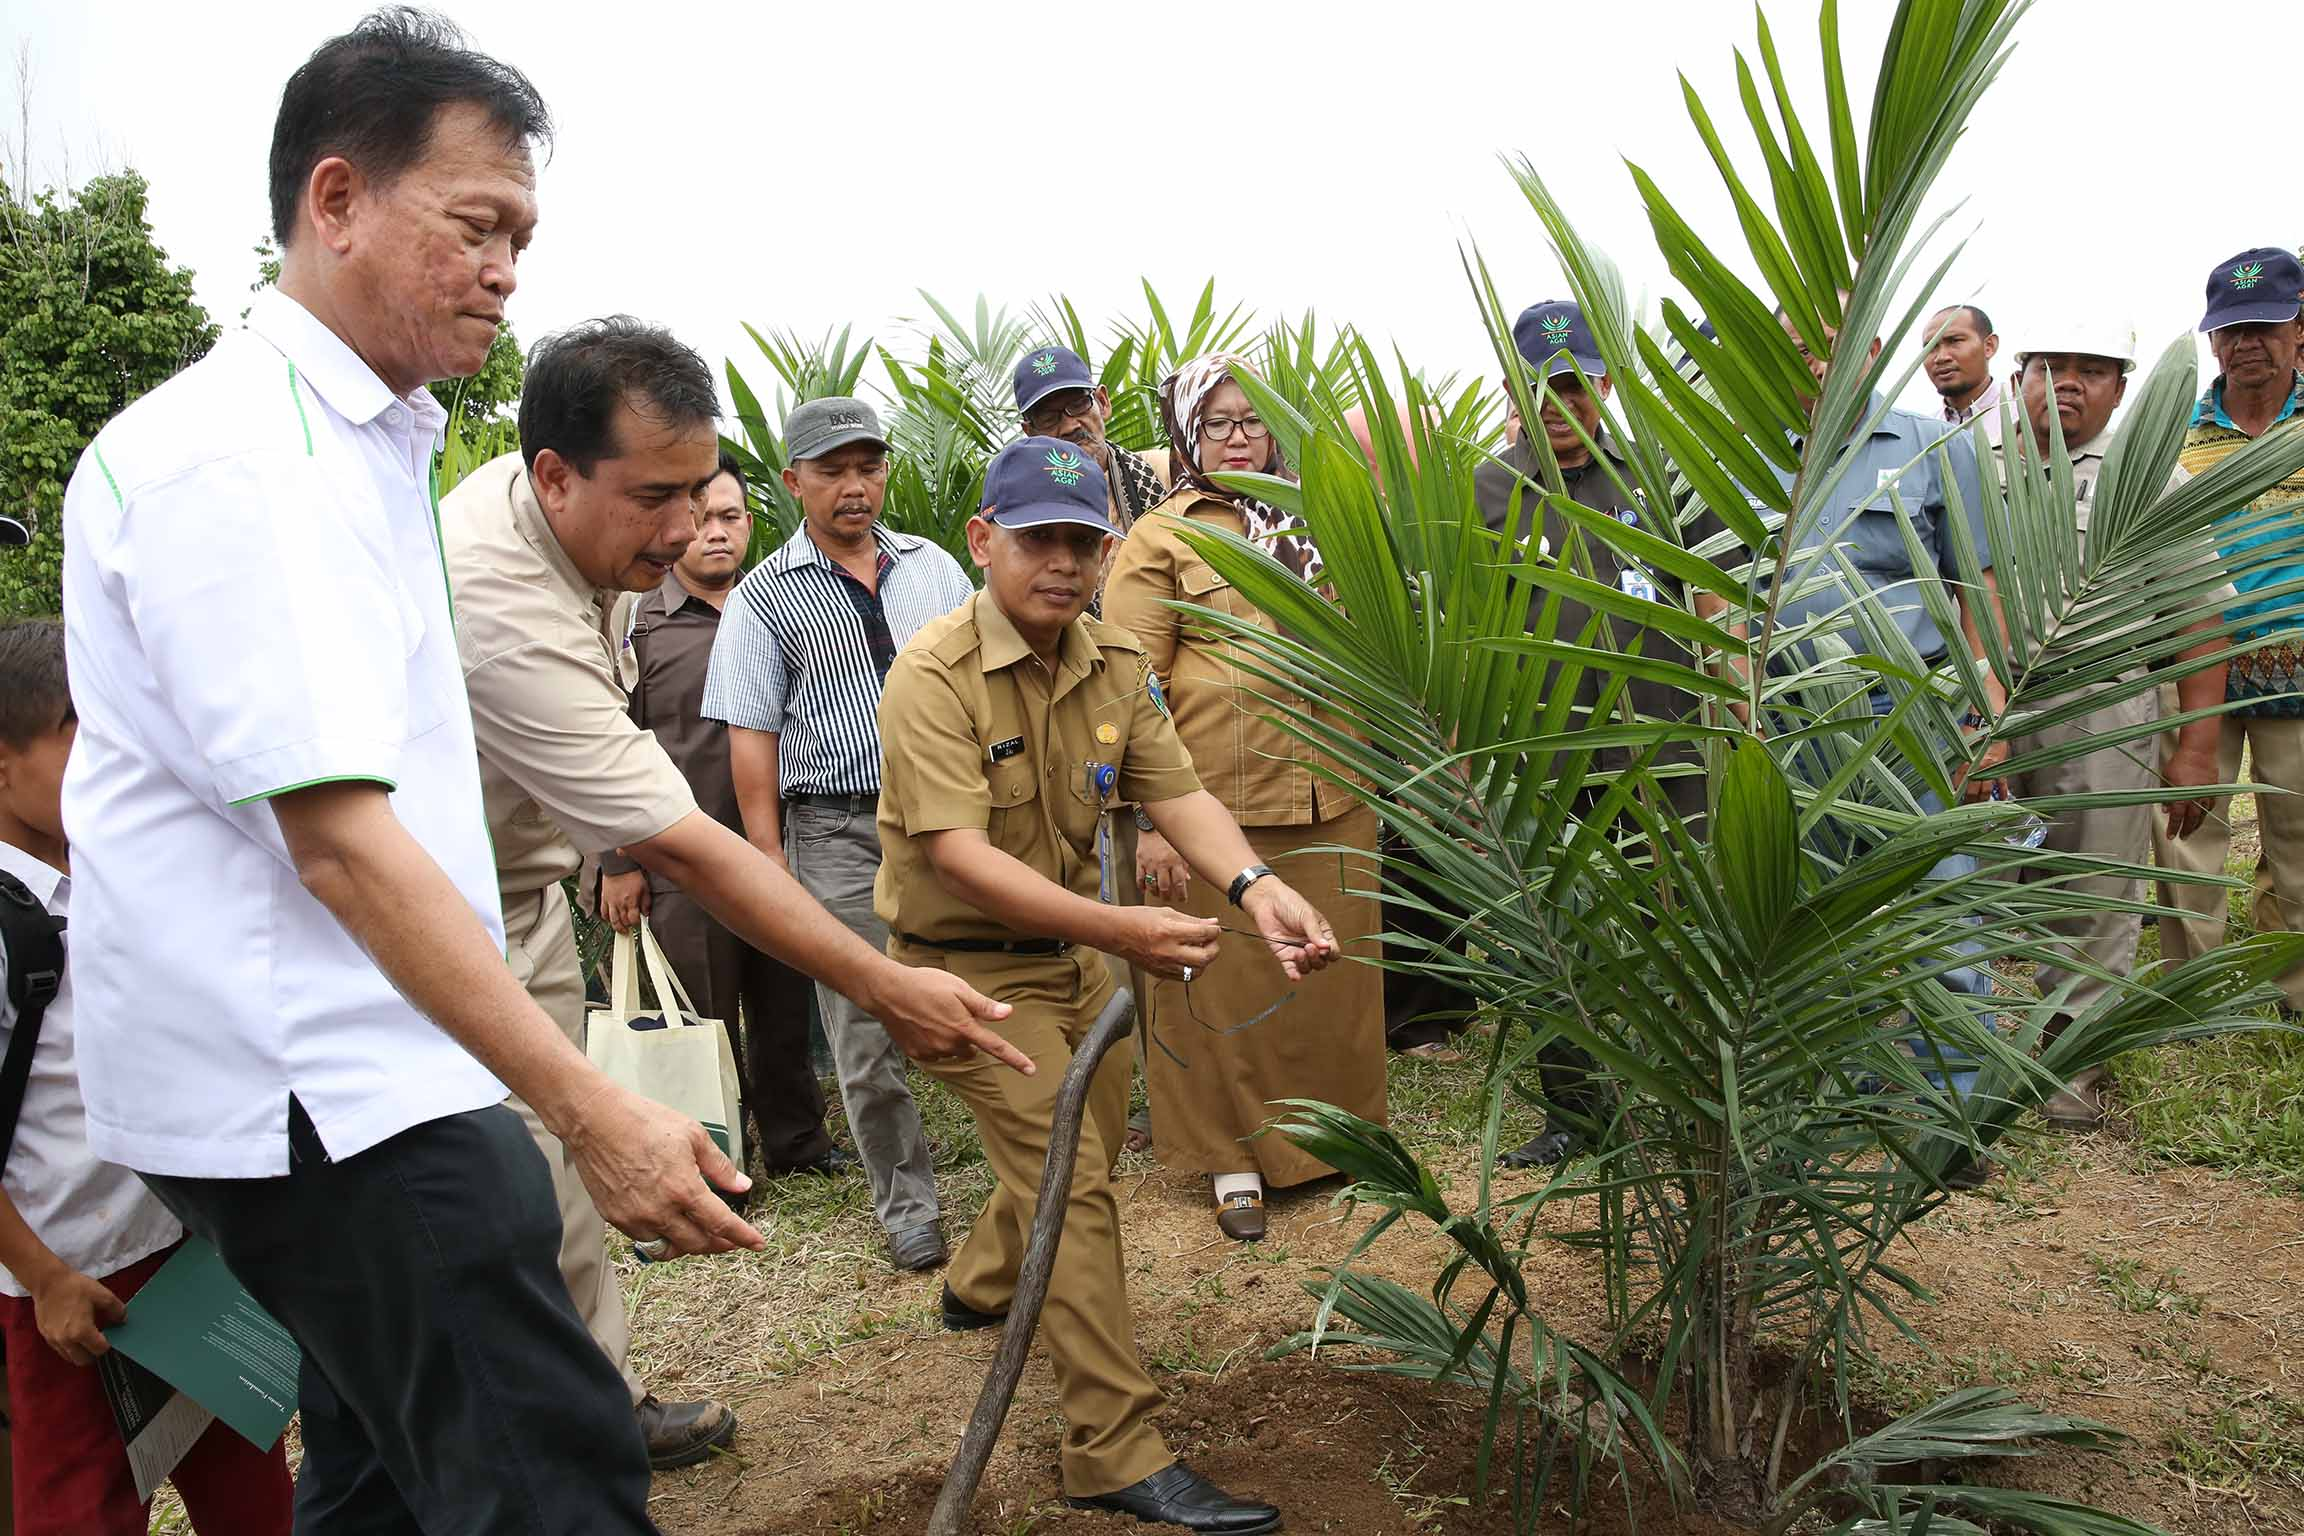 Rizal, Regional Secretariat of Batanghari District, Jambi, conducts first oil palm tree planting to mark the inauguration of Sekolah Sawit Lestari program in Indonesia